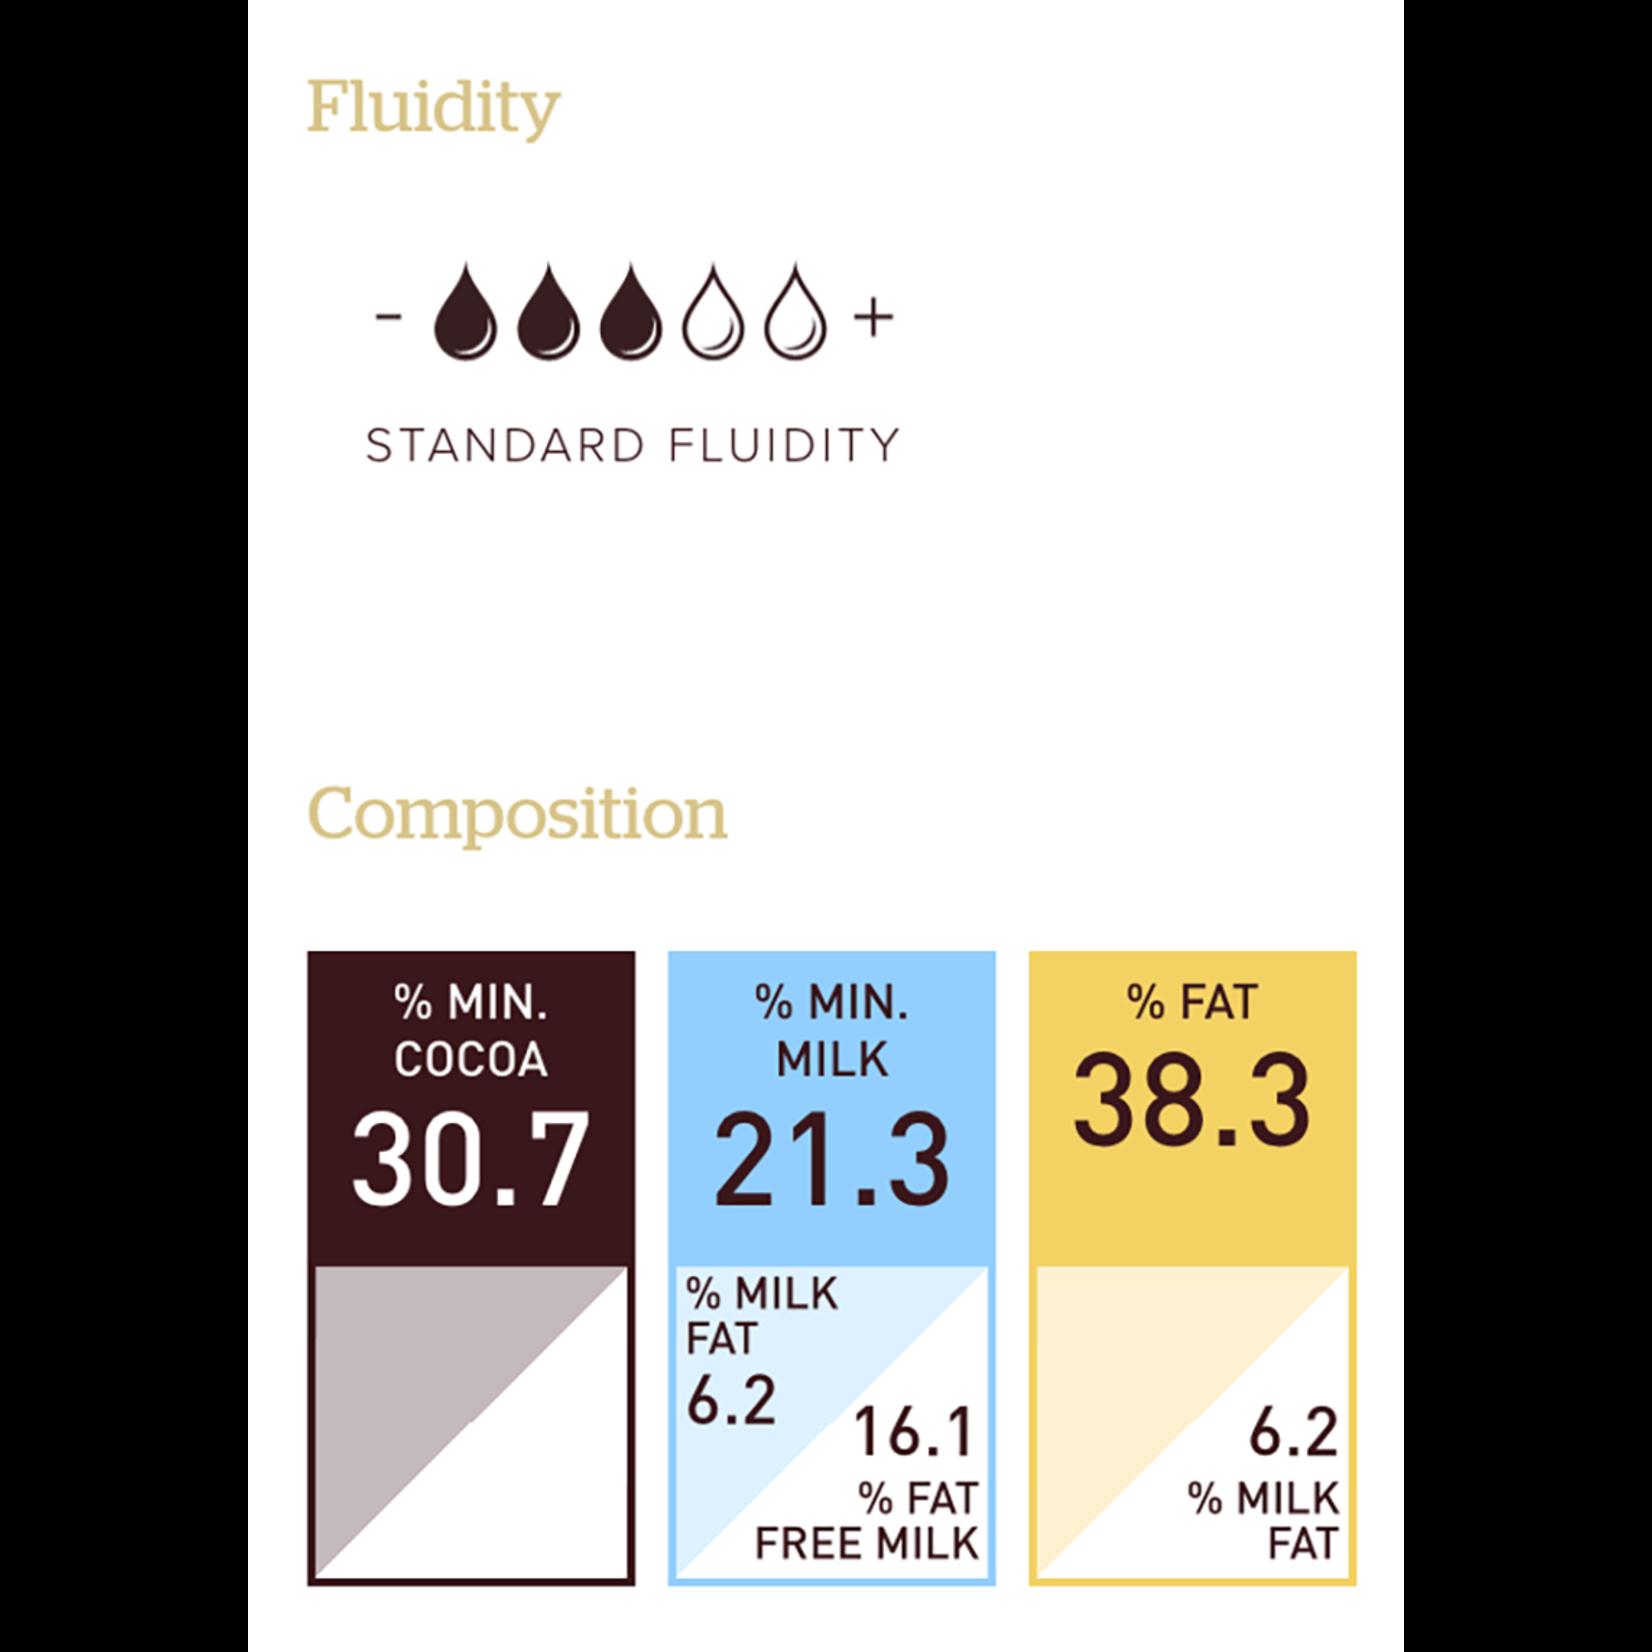 Barry Callebaut Barry Callebaut - No Sugar Added White Chocolate Block 30.6% - 5kg/11lb, MALCHOC-W-123 (box of 5)